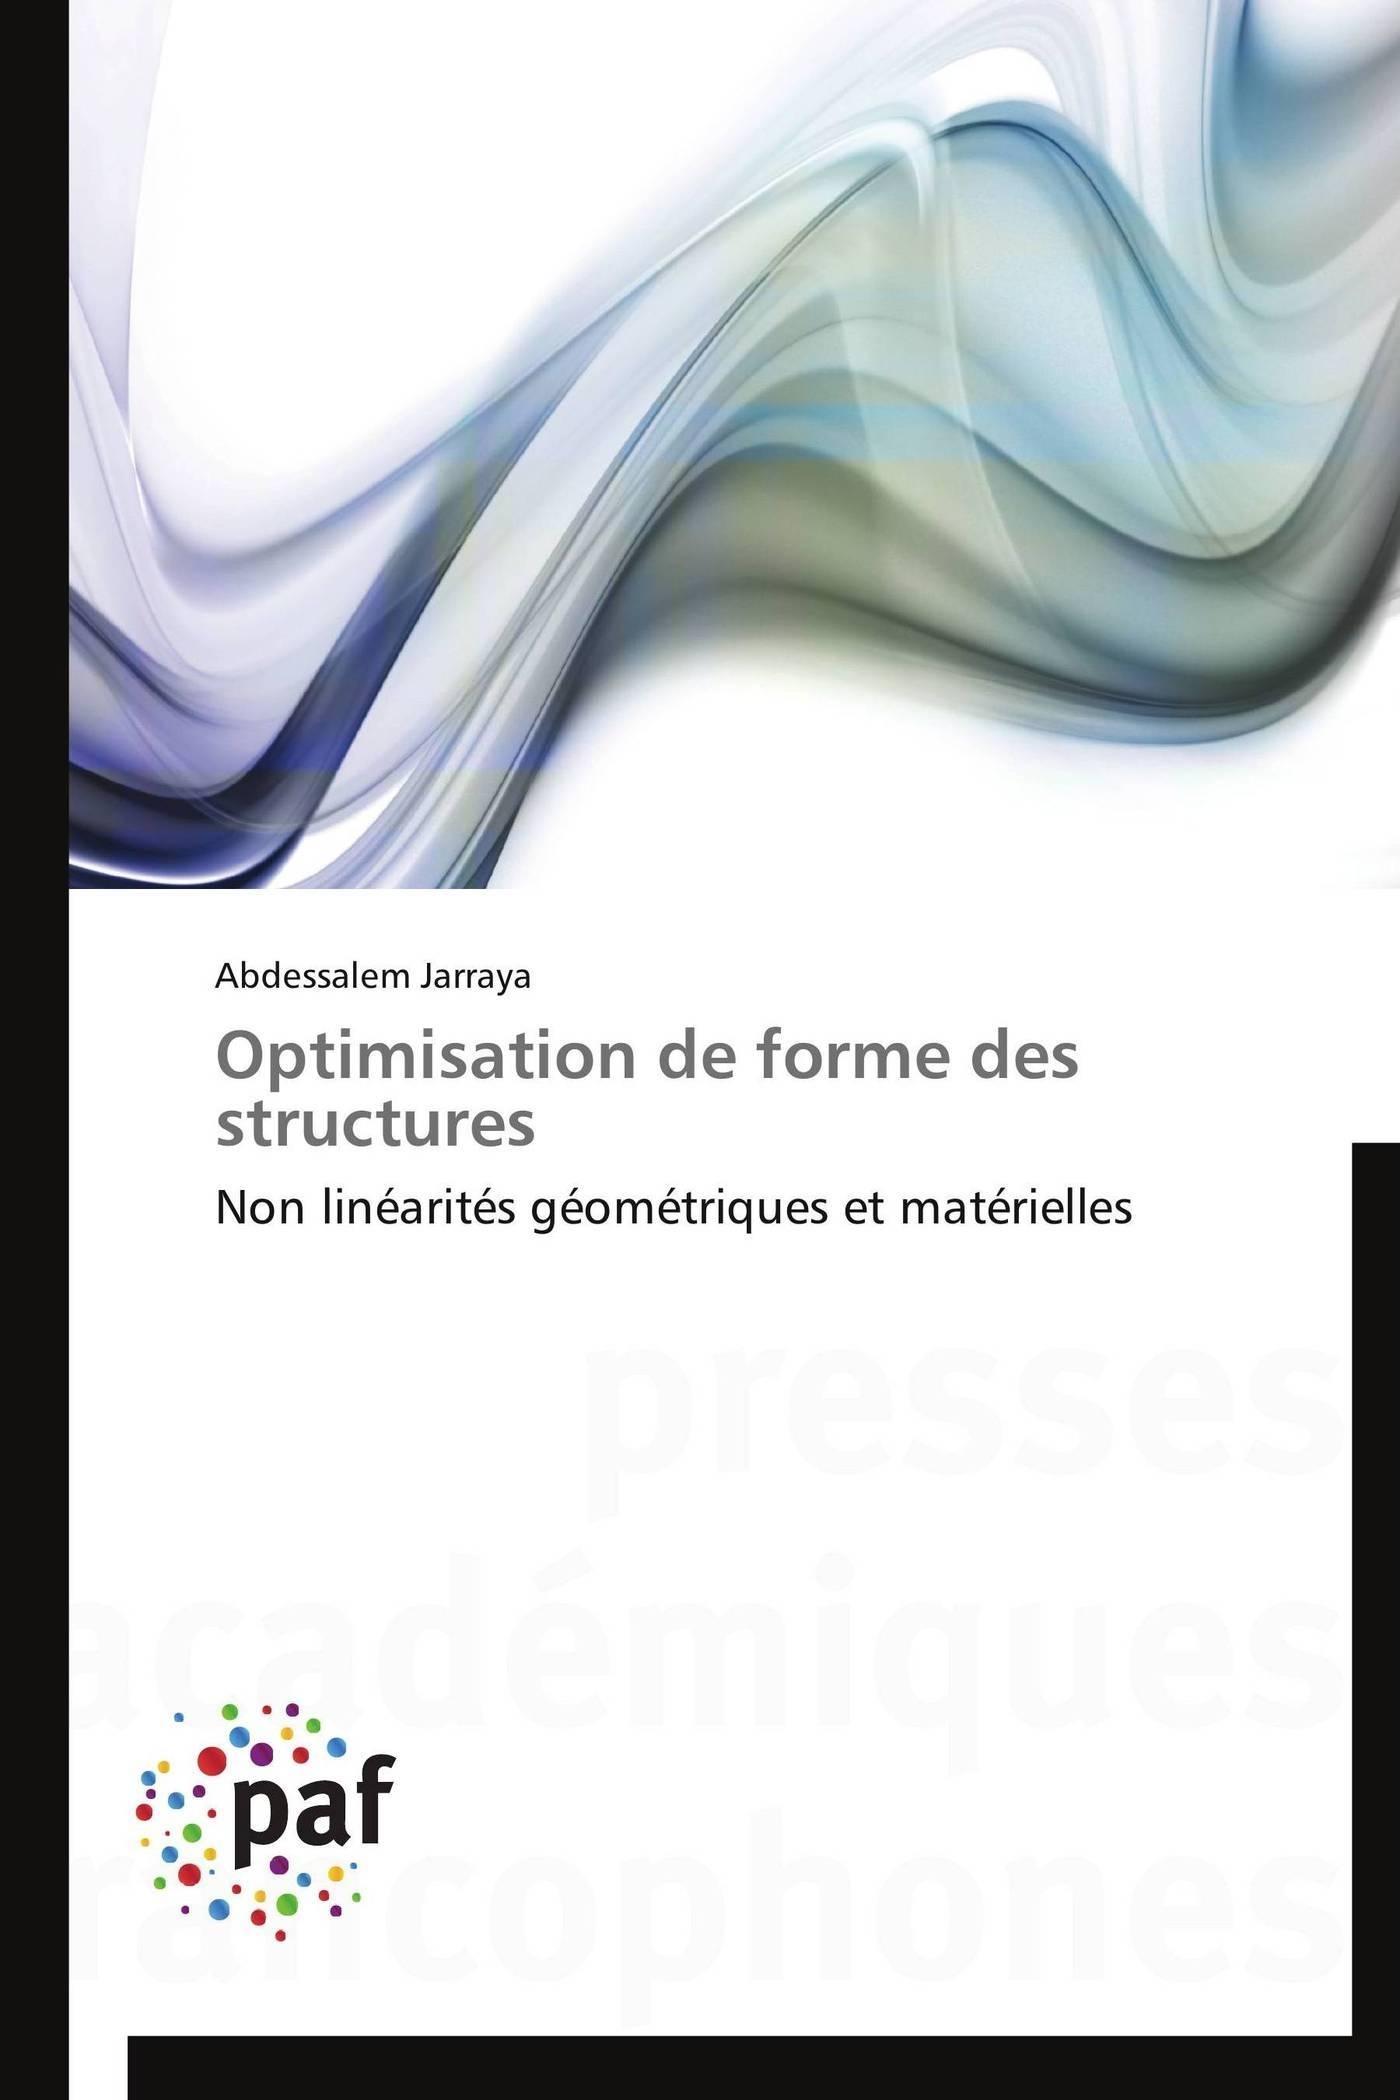 OPTIMISATION DE FORME DES STRUCTURES